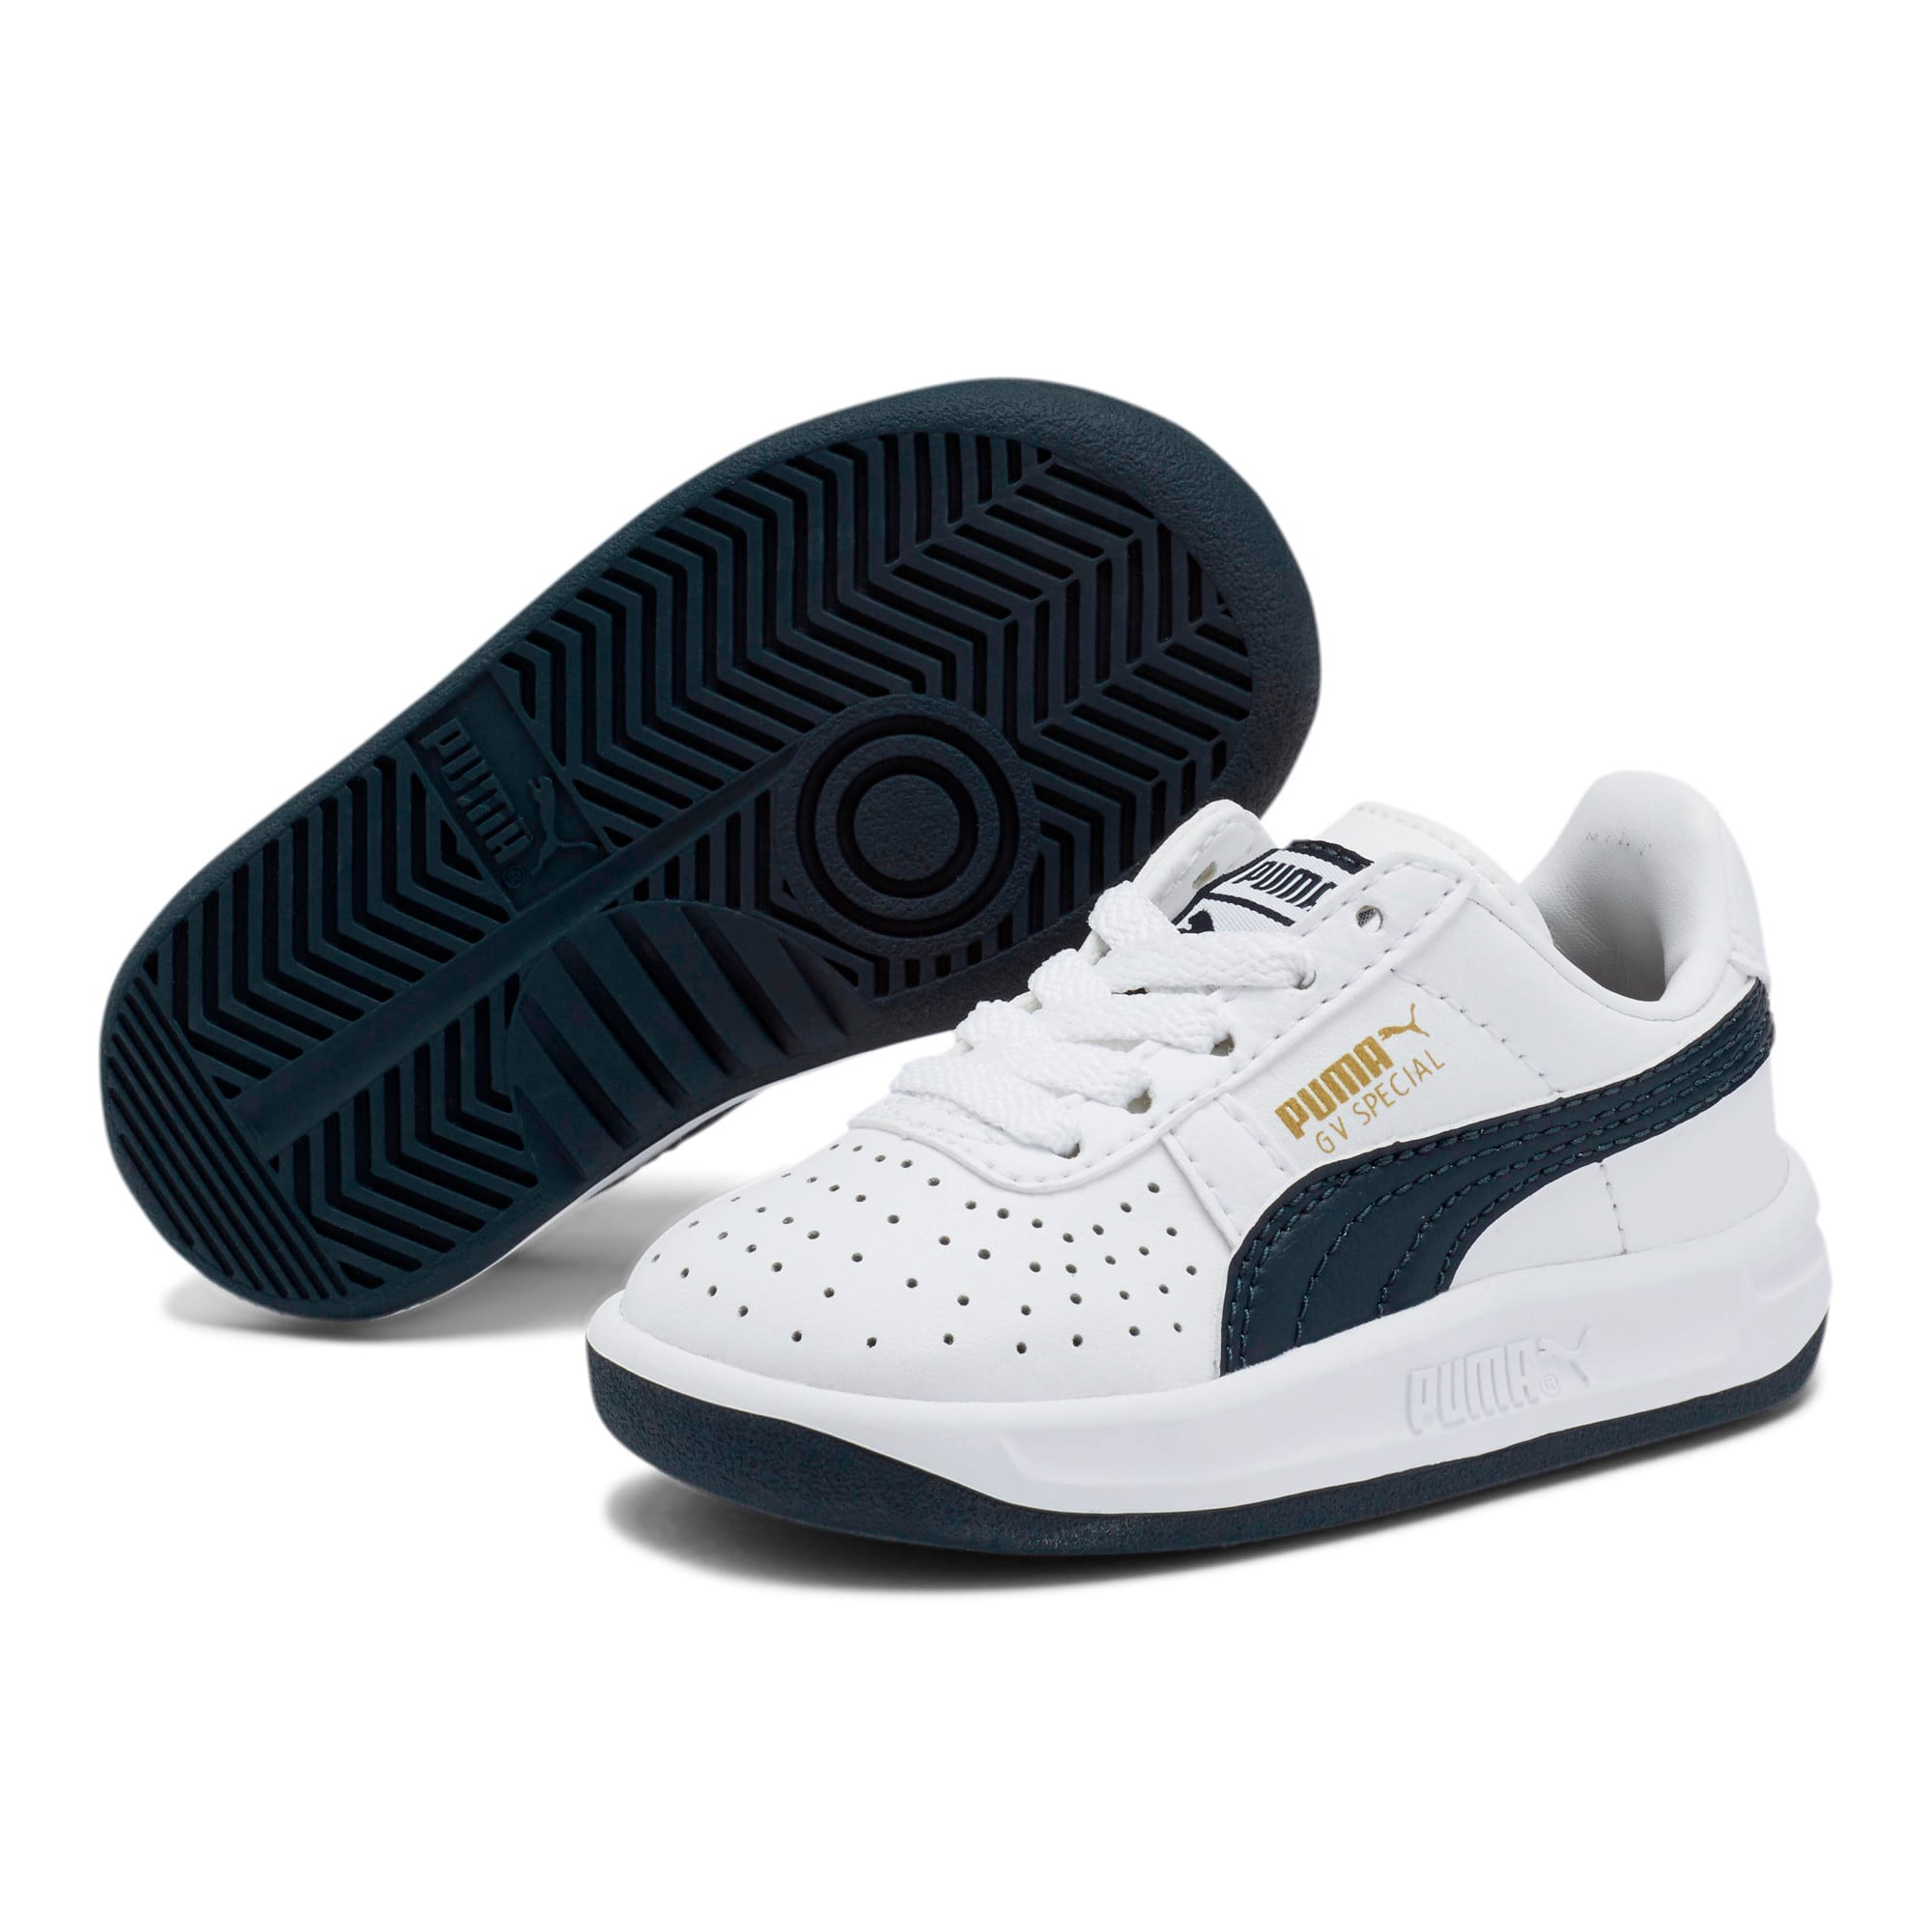 Thumbnail 2 of GV Special Toddler Shoes, Puma White-Peacoat, medium